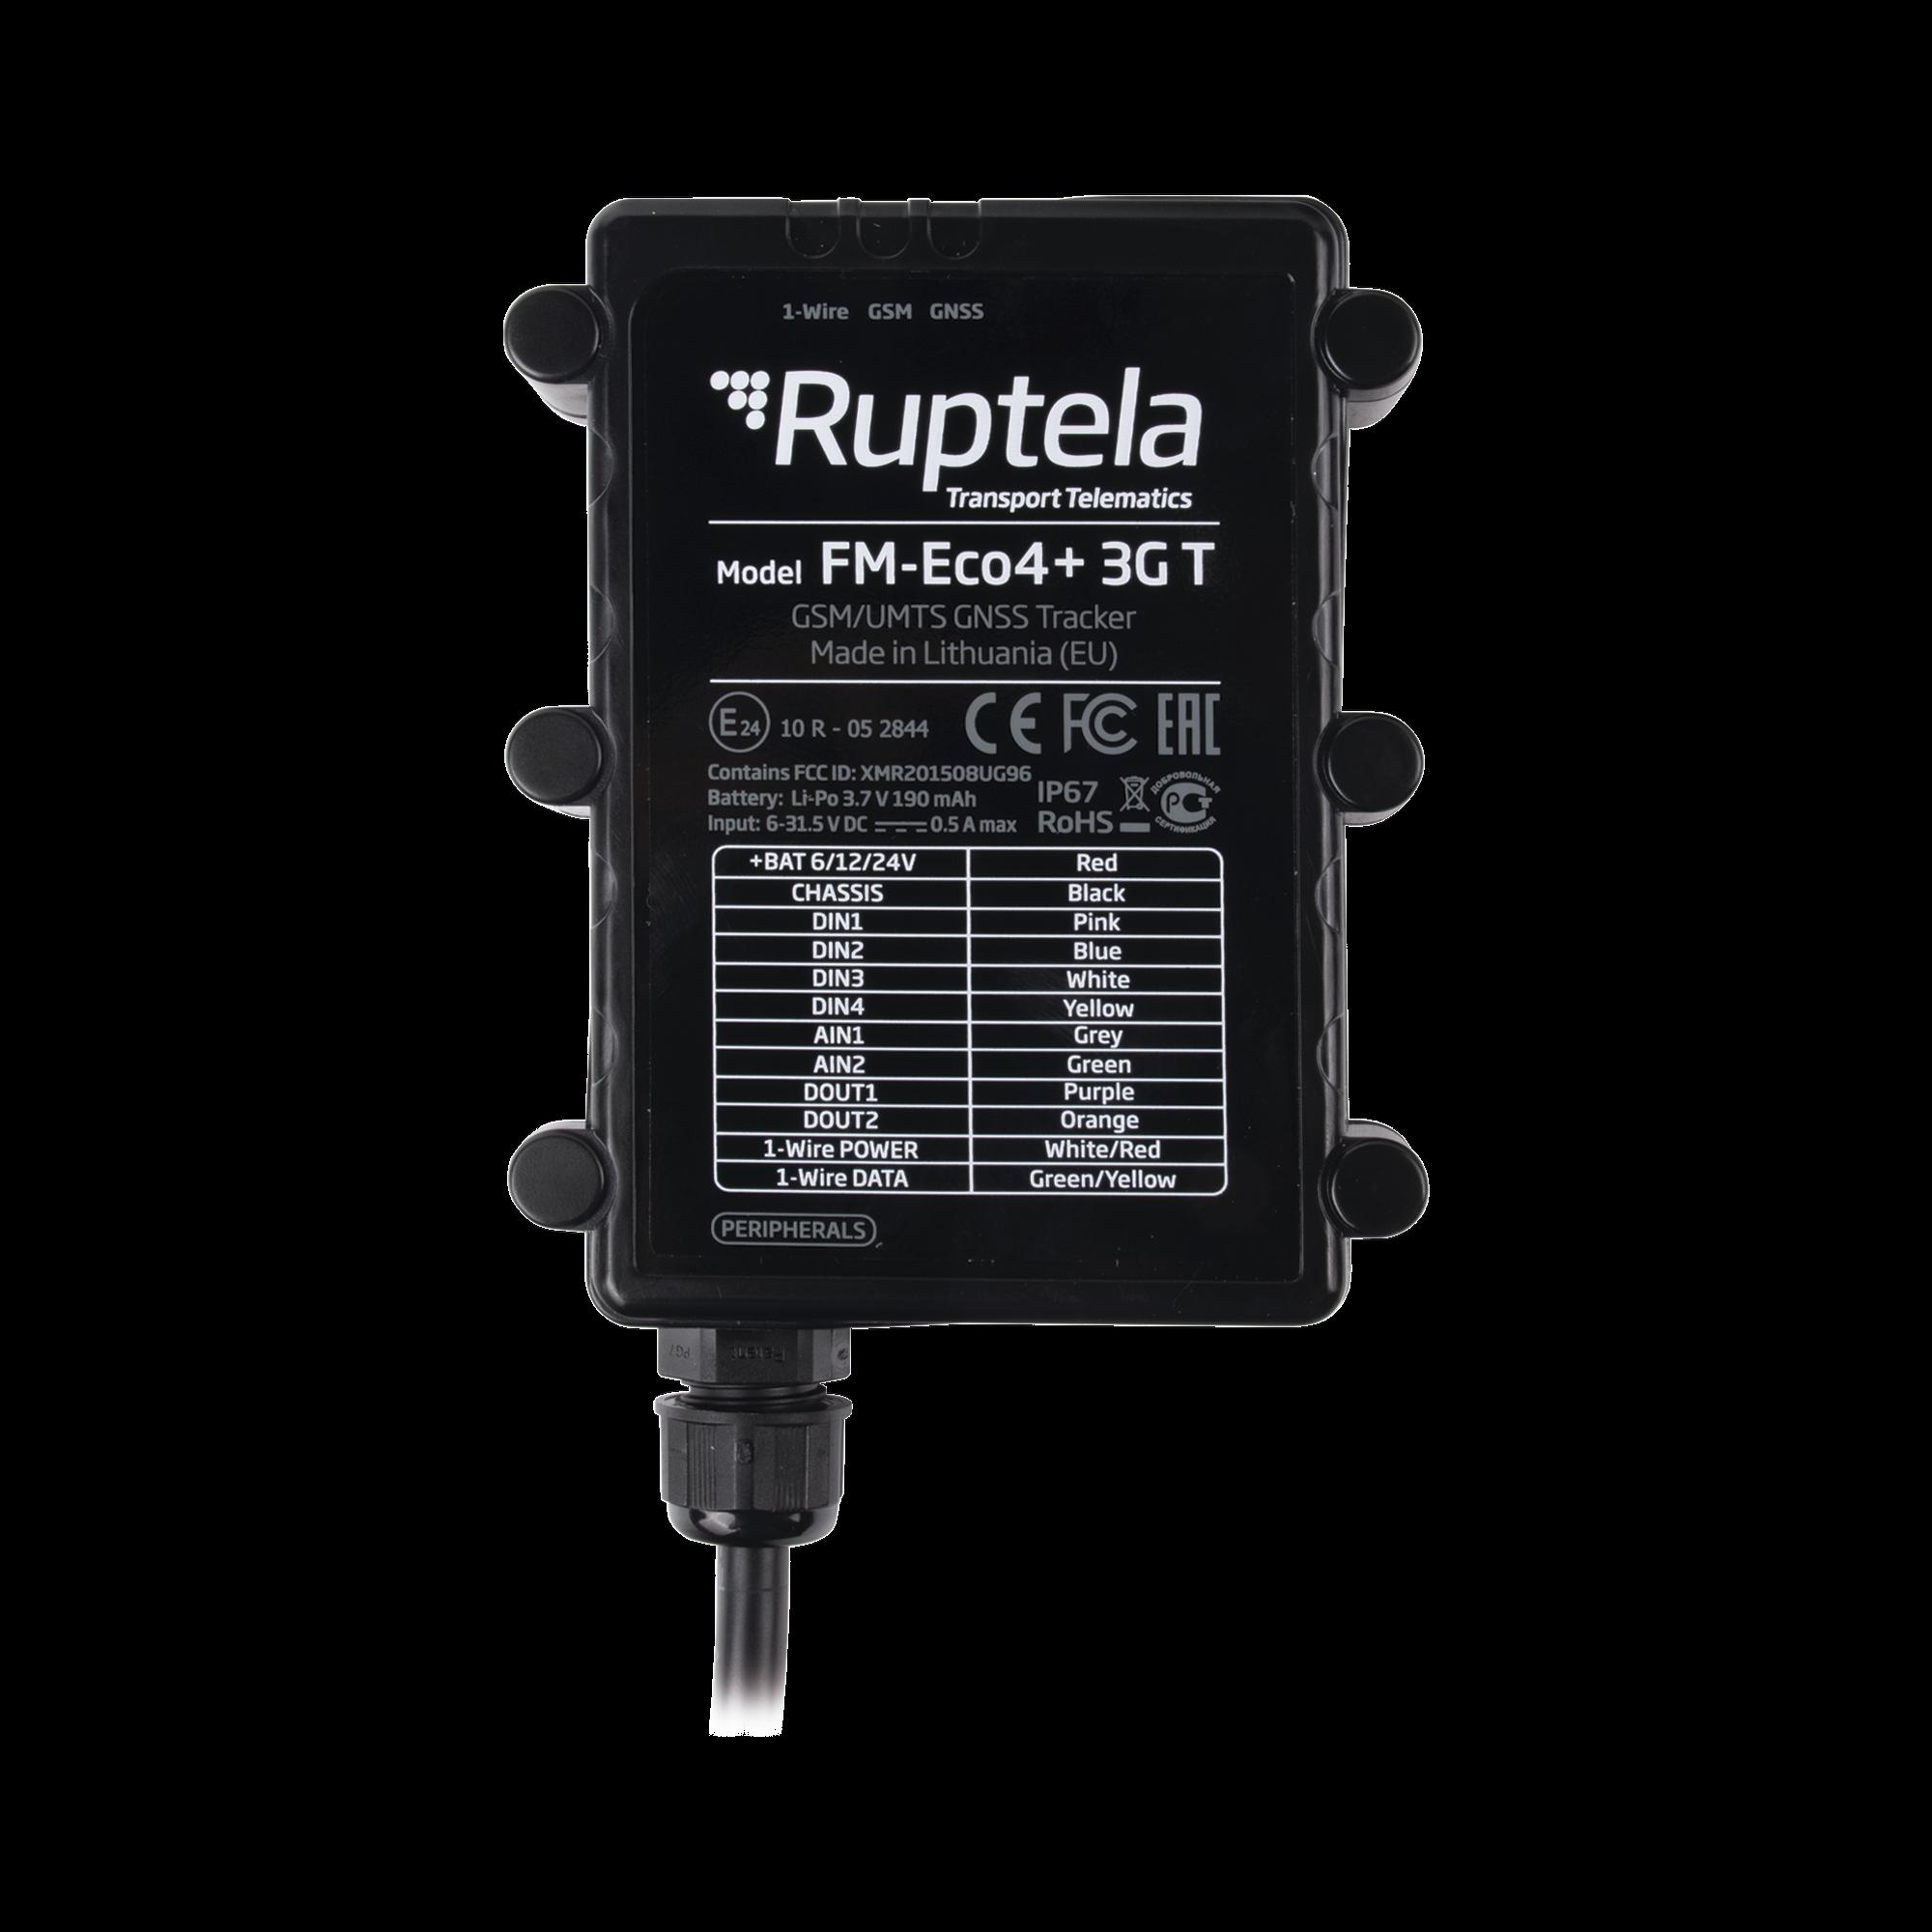 Localizador vehicular 3G / Antenas internas / Contra agua y polvo IP67 / ideal para motocicletas / RFID / Apagado de motor a distancia / Anti Jammer